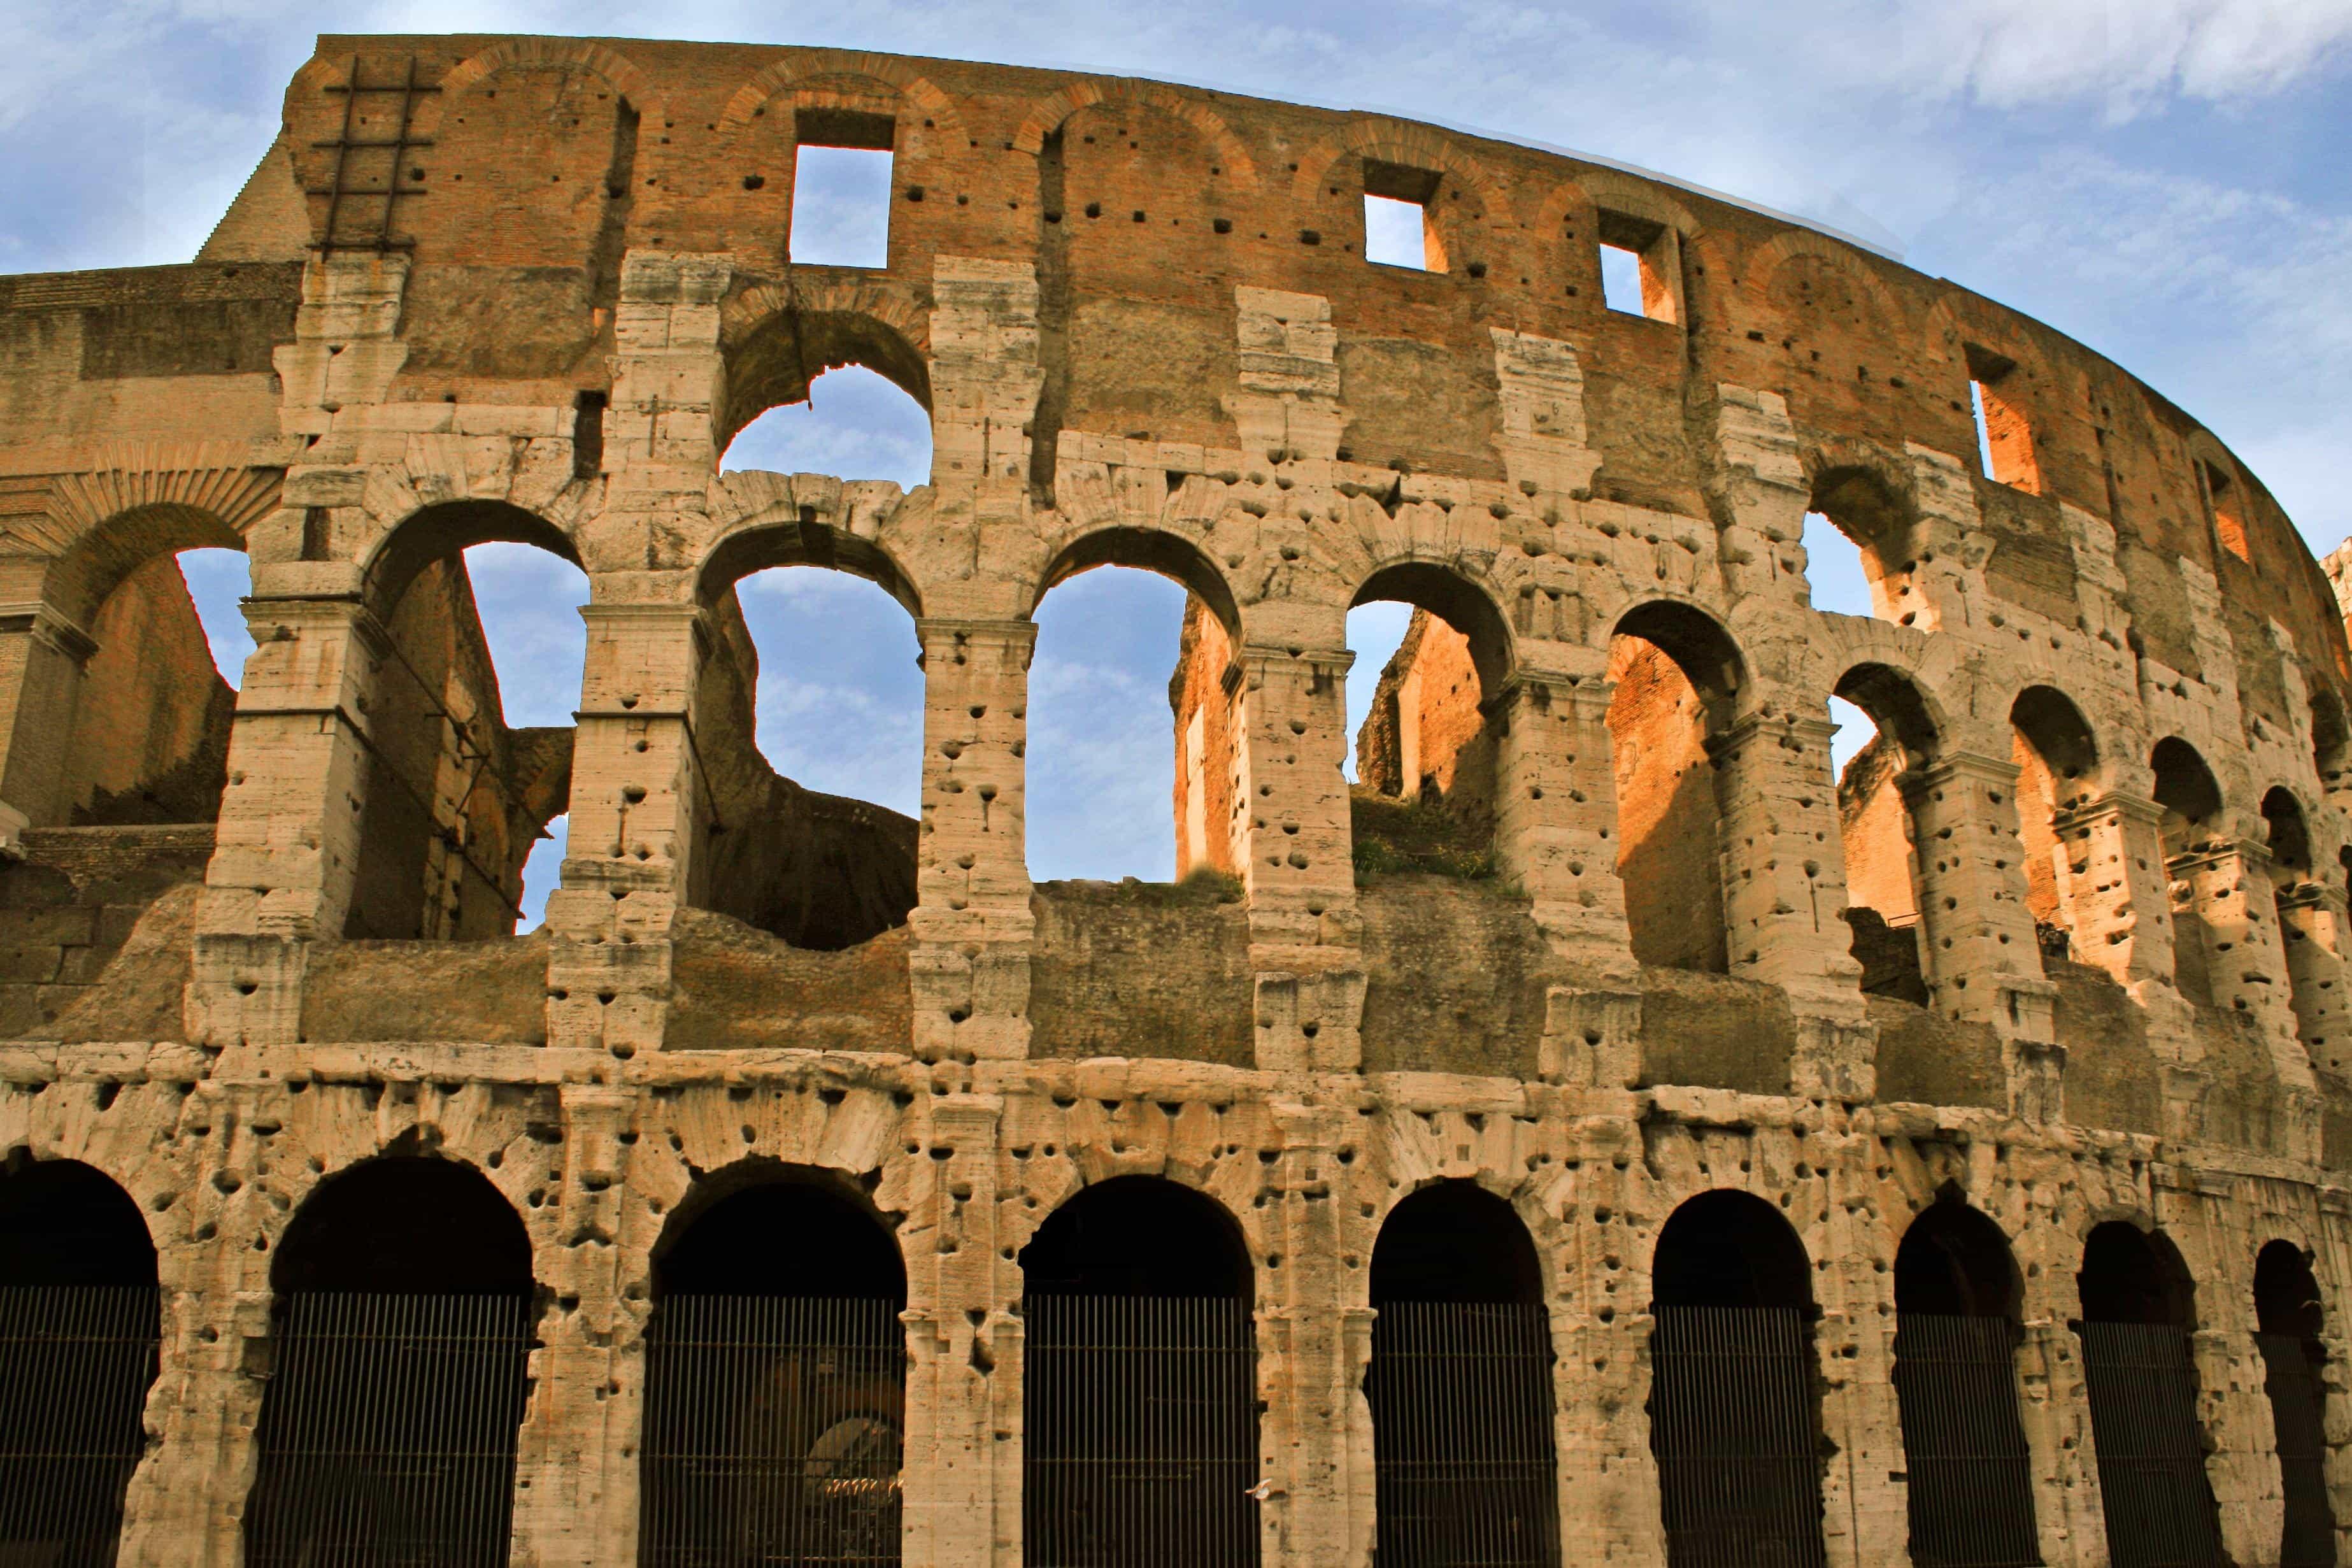 школах архитектура древности картинки многих это